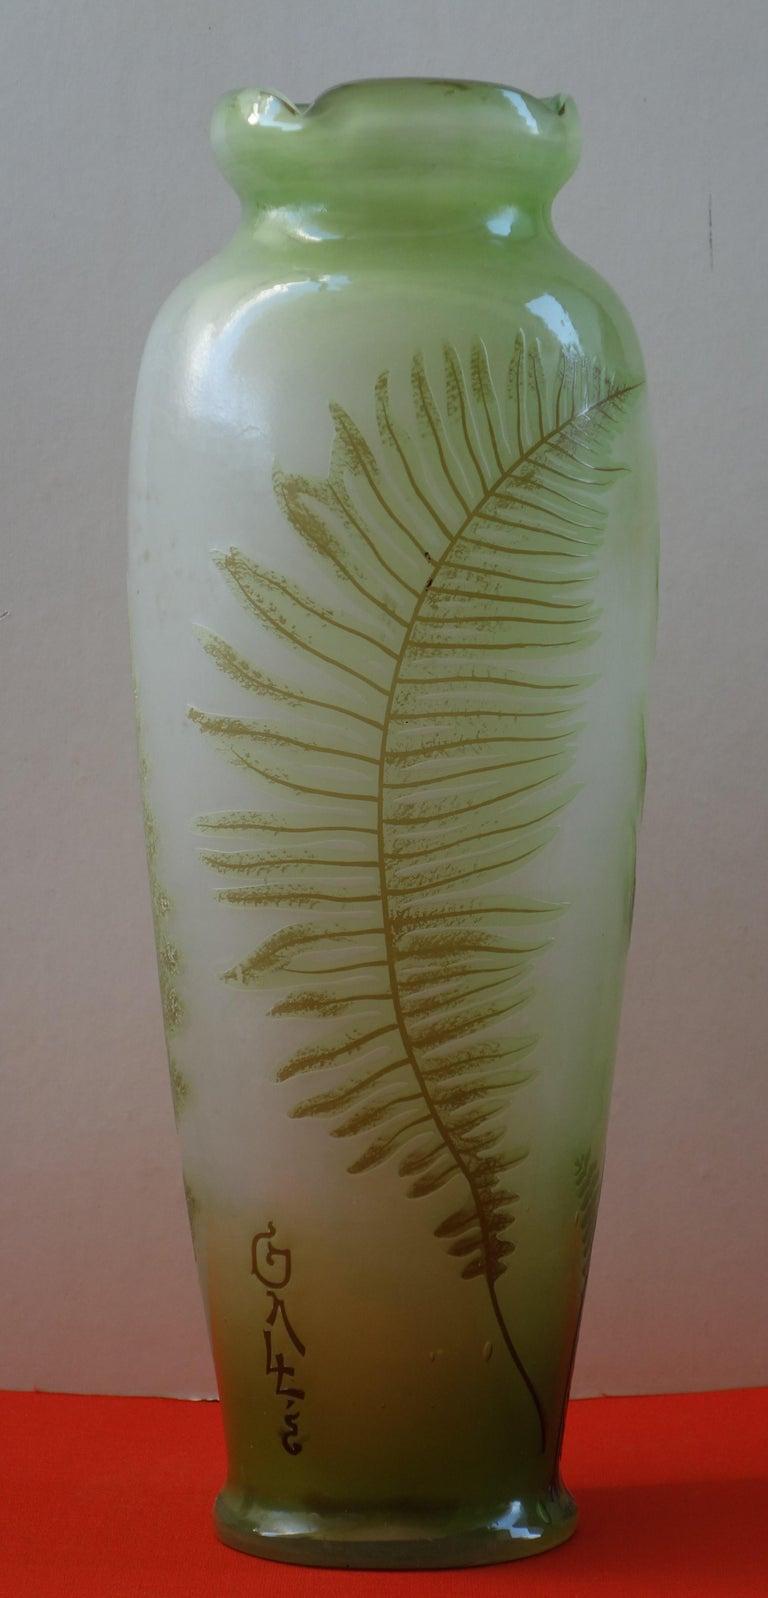 Art Nouveau French Cameo Glass 'Fern Vase' by Emile Gallé, Nancy - 42cm High For Sale 1